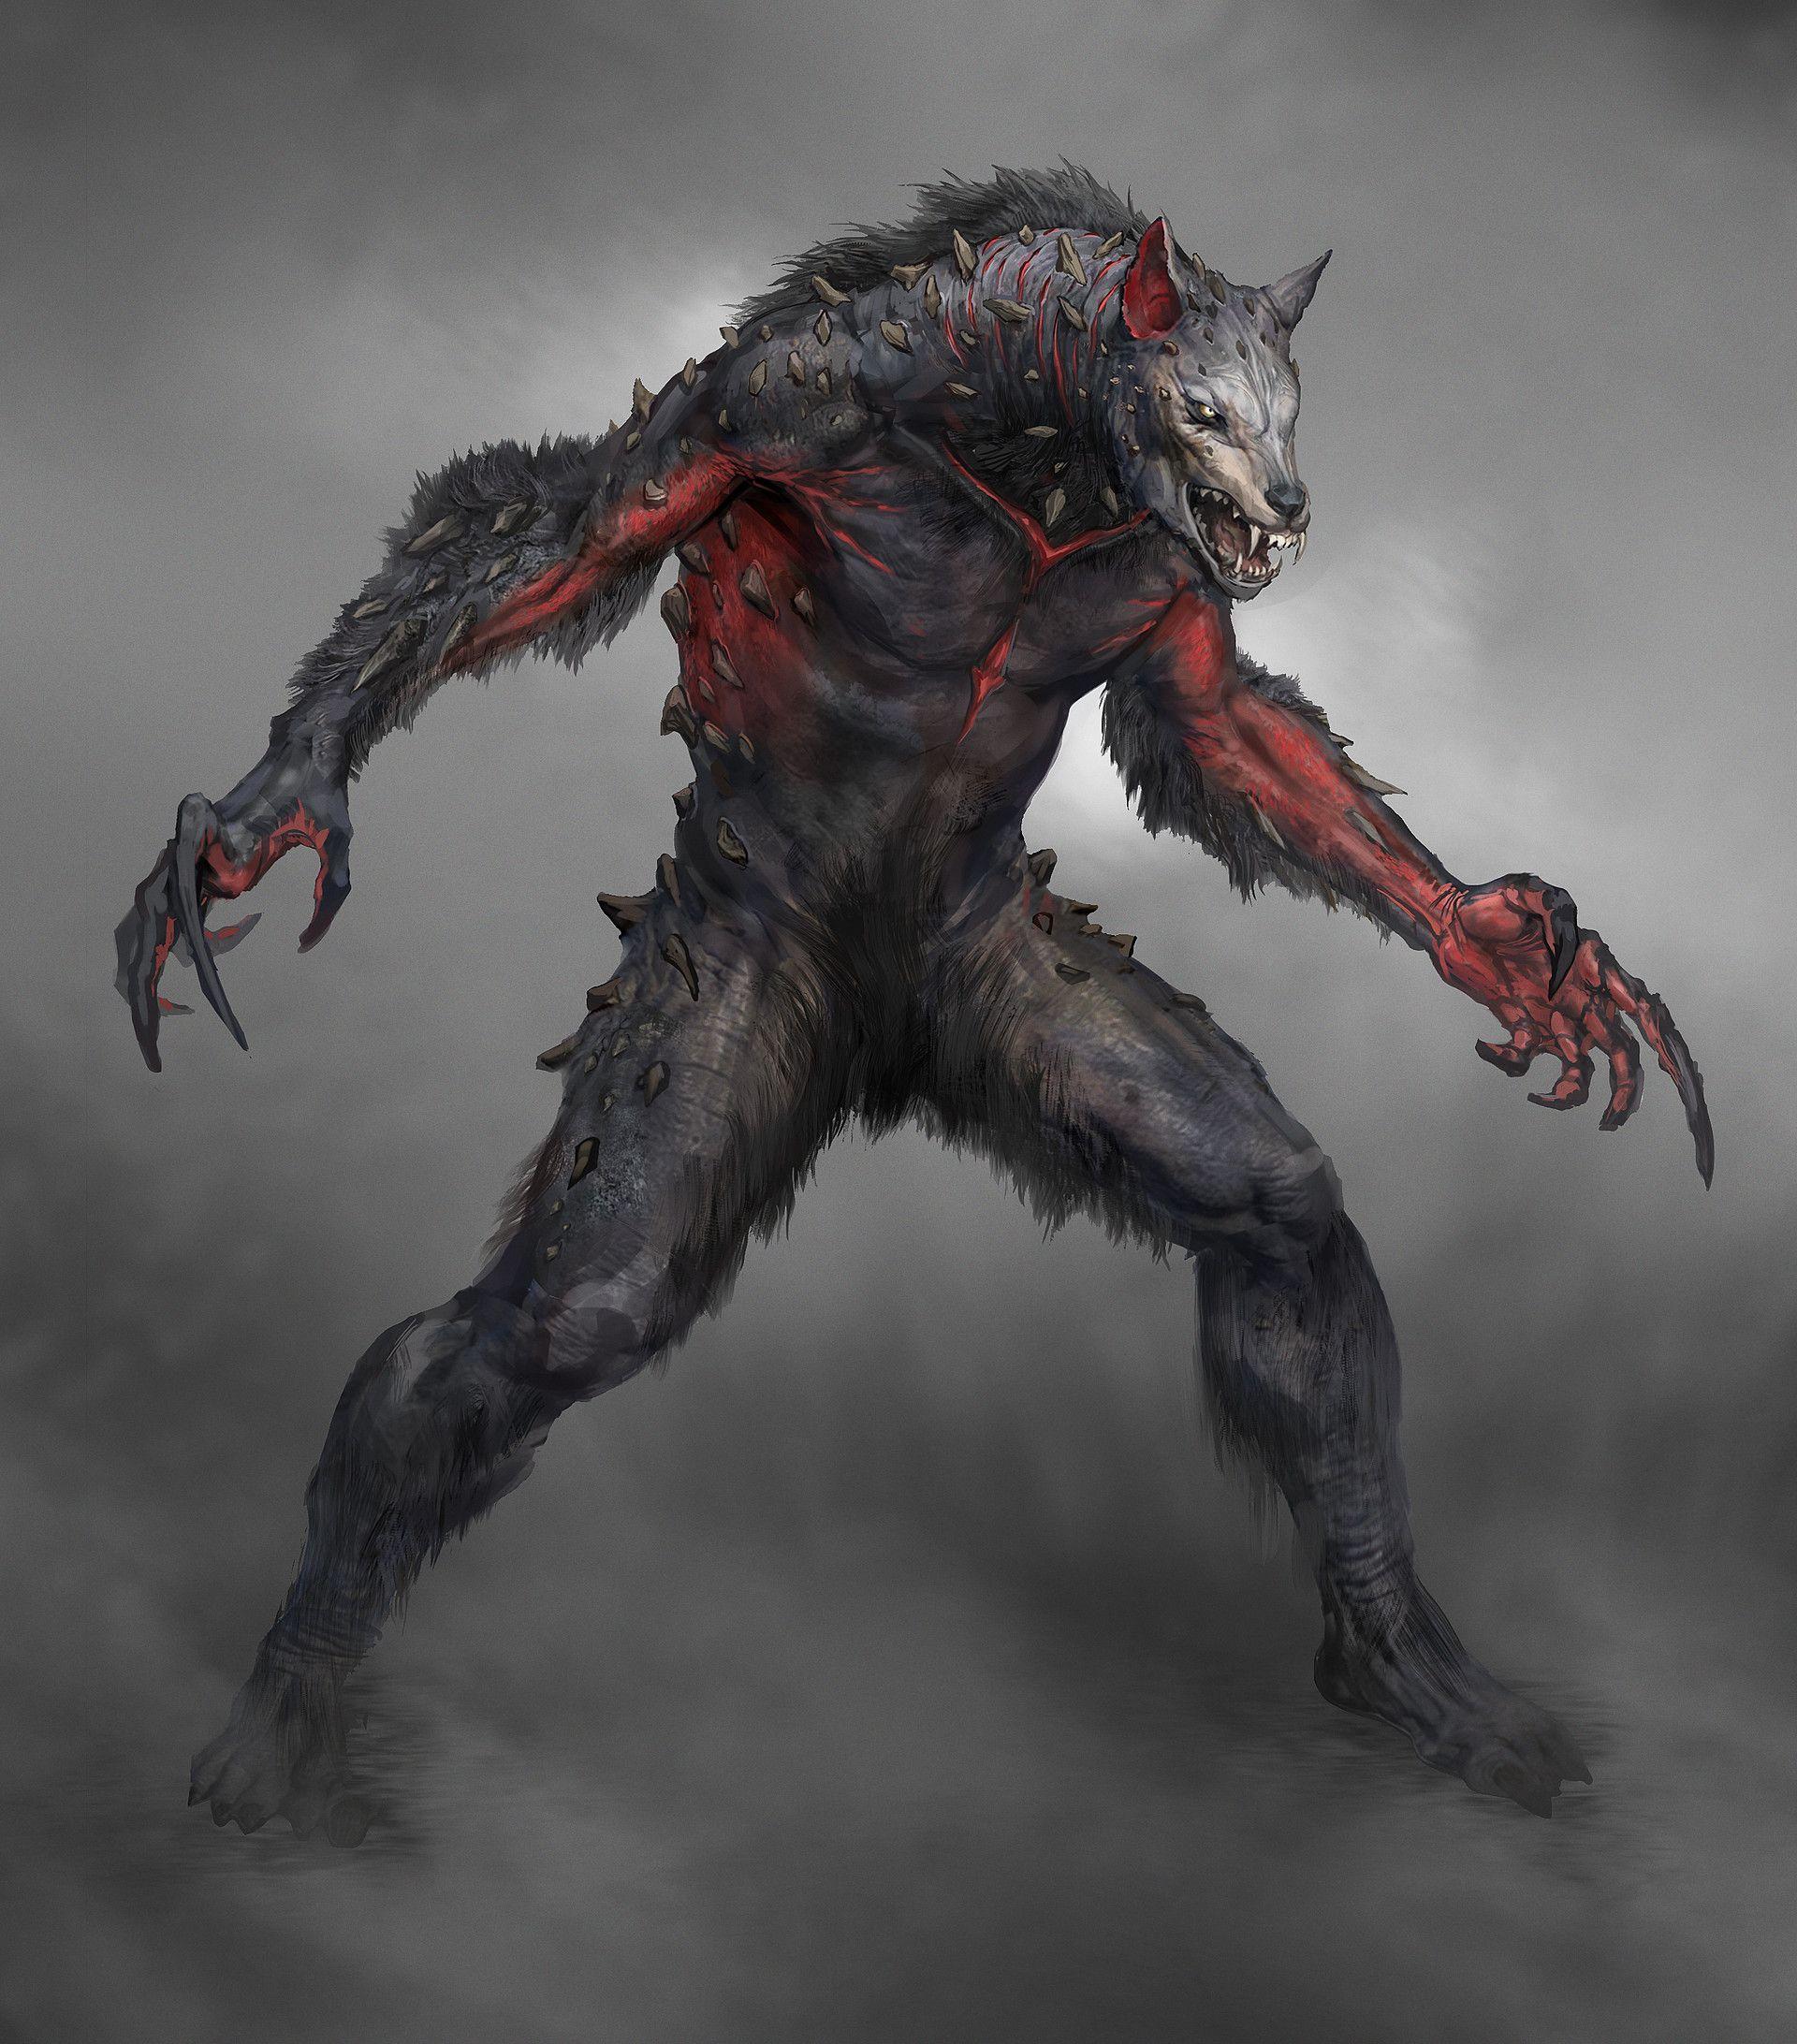 Artstation Wulver Yefim Kligerman Monstros Criaturas Escuras Lobisomens